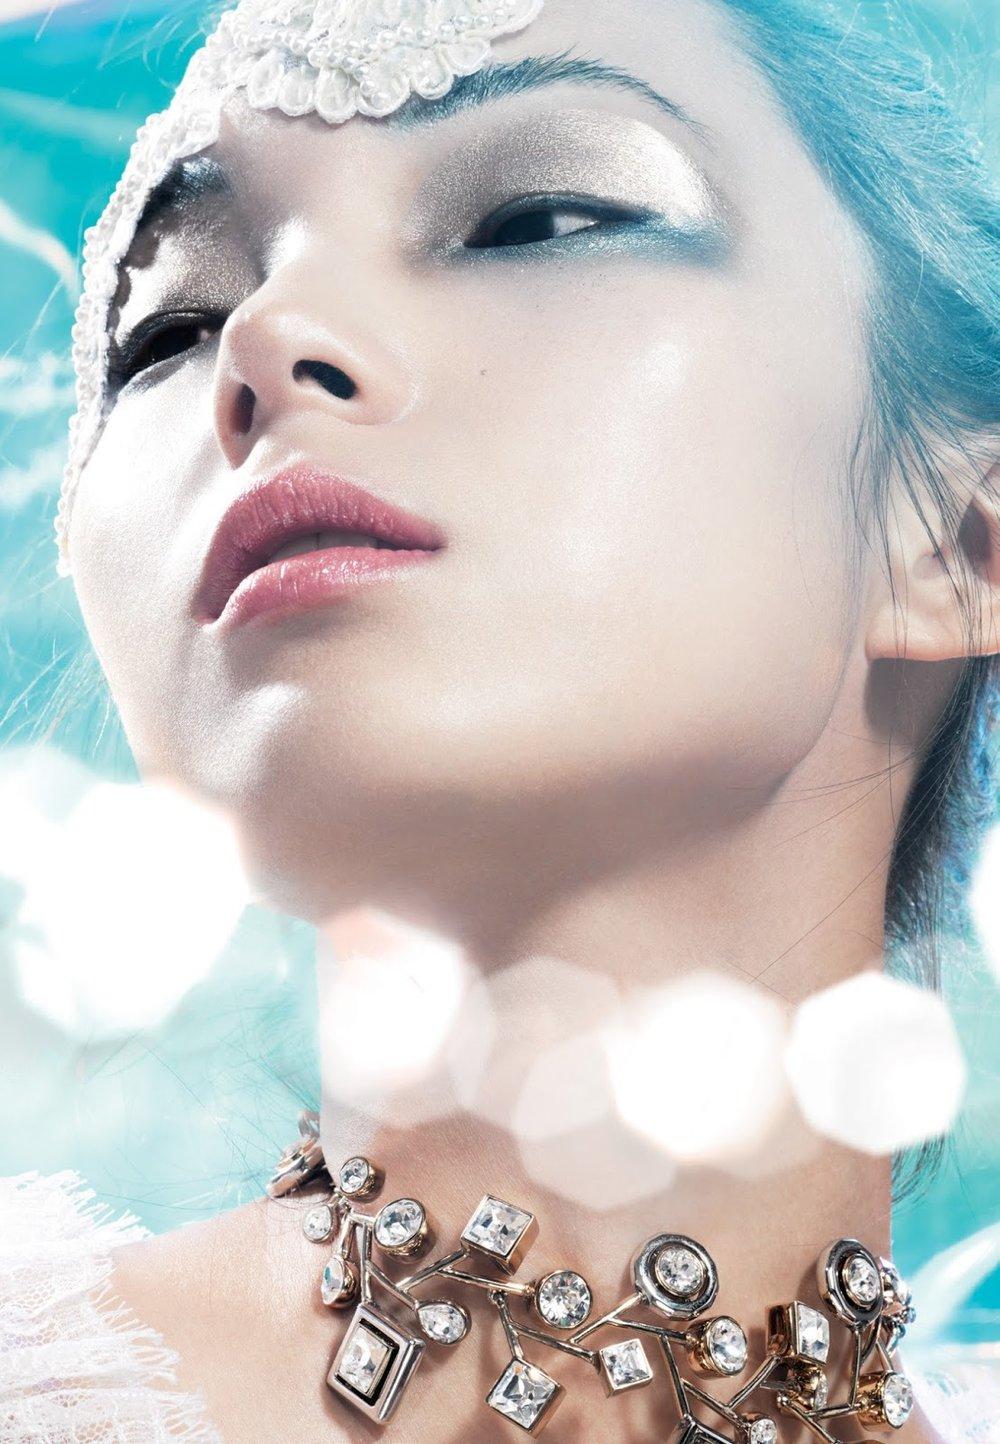 Vogue China Dec-xuai-wen-ju-kenneth-willardt- (3).jpg